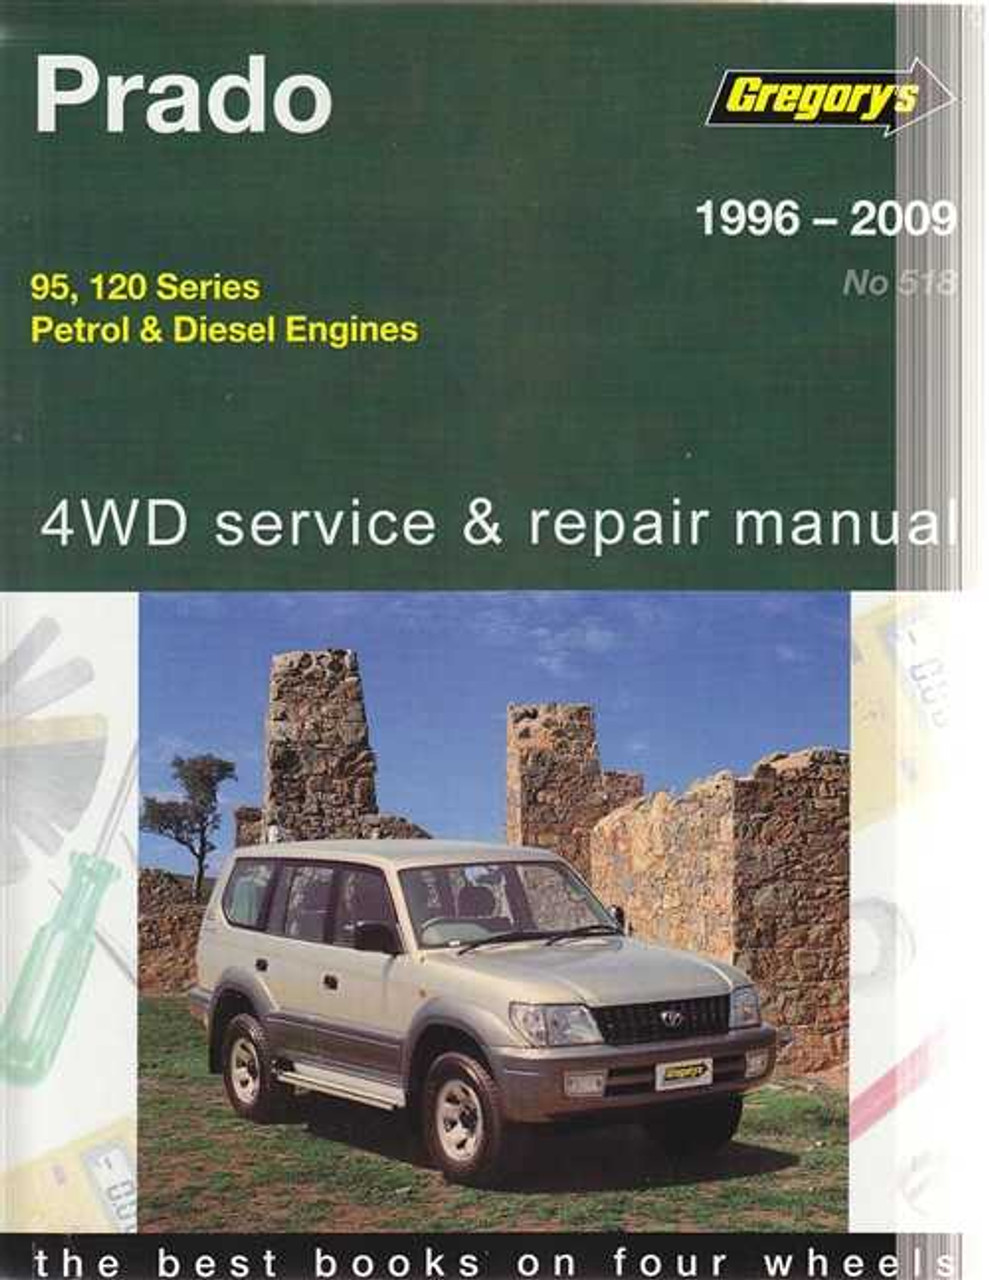 toyota prado 95 120 series petrol diesel 4wd 1996 2009 workshop rh automotobookshop com au Operators Manual Repair Manuals